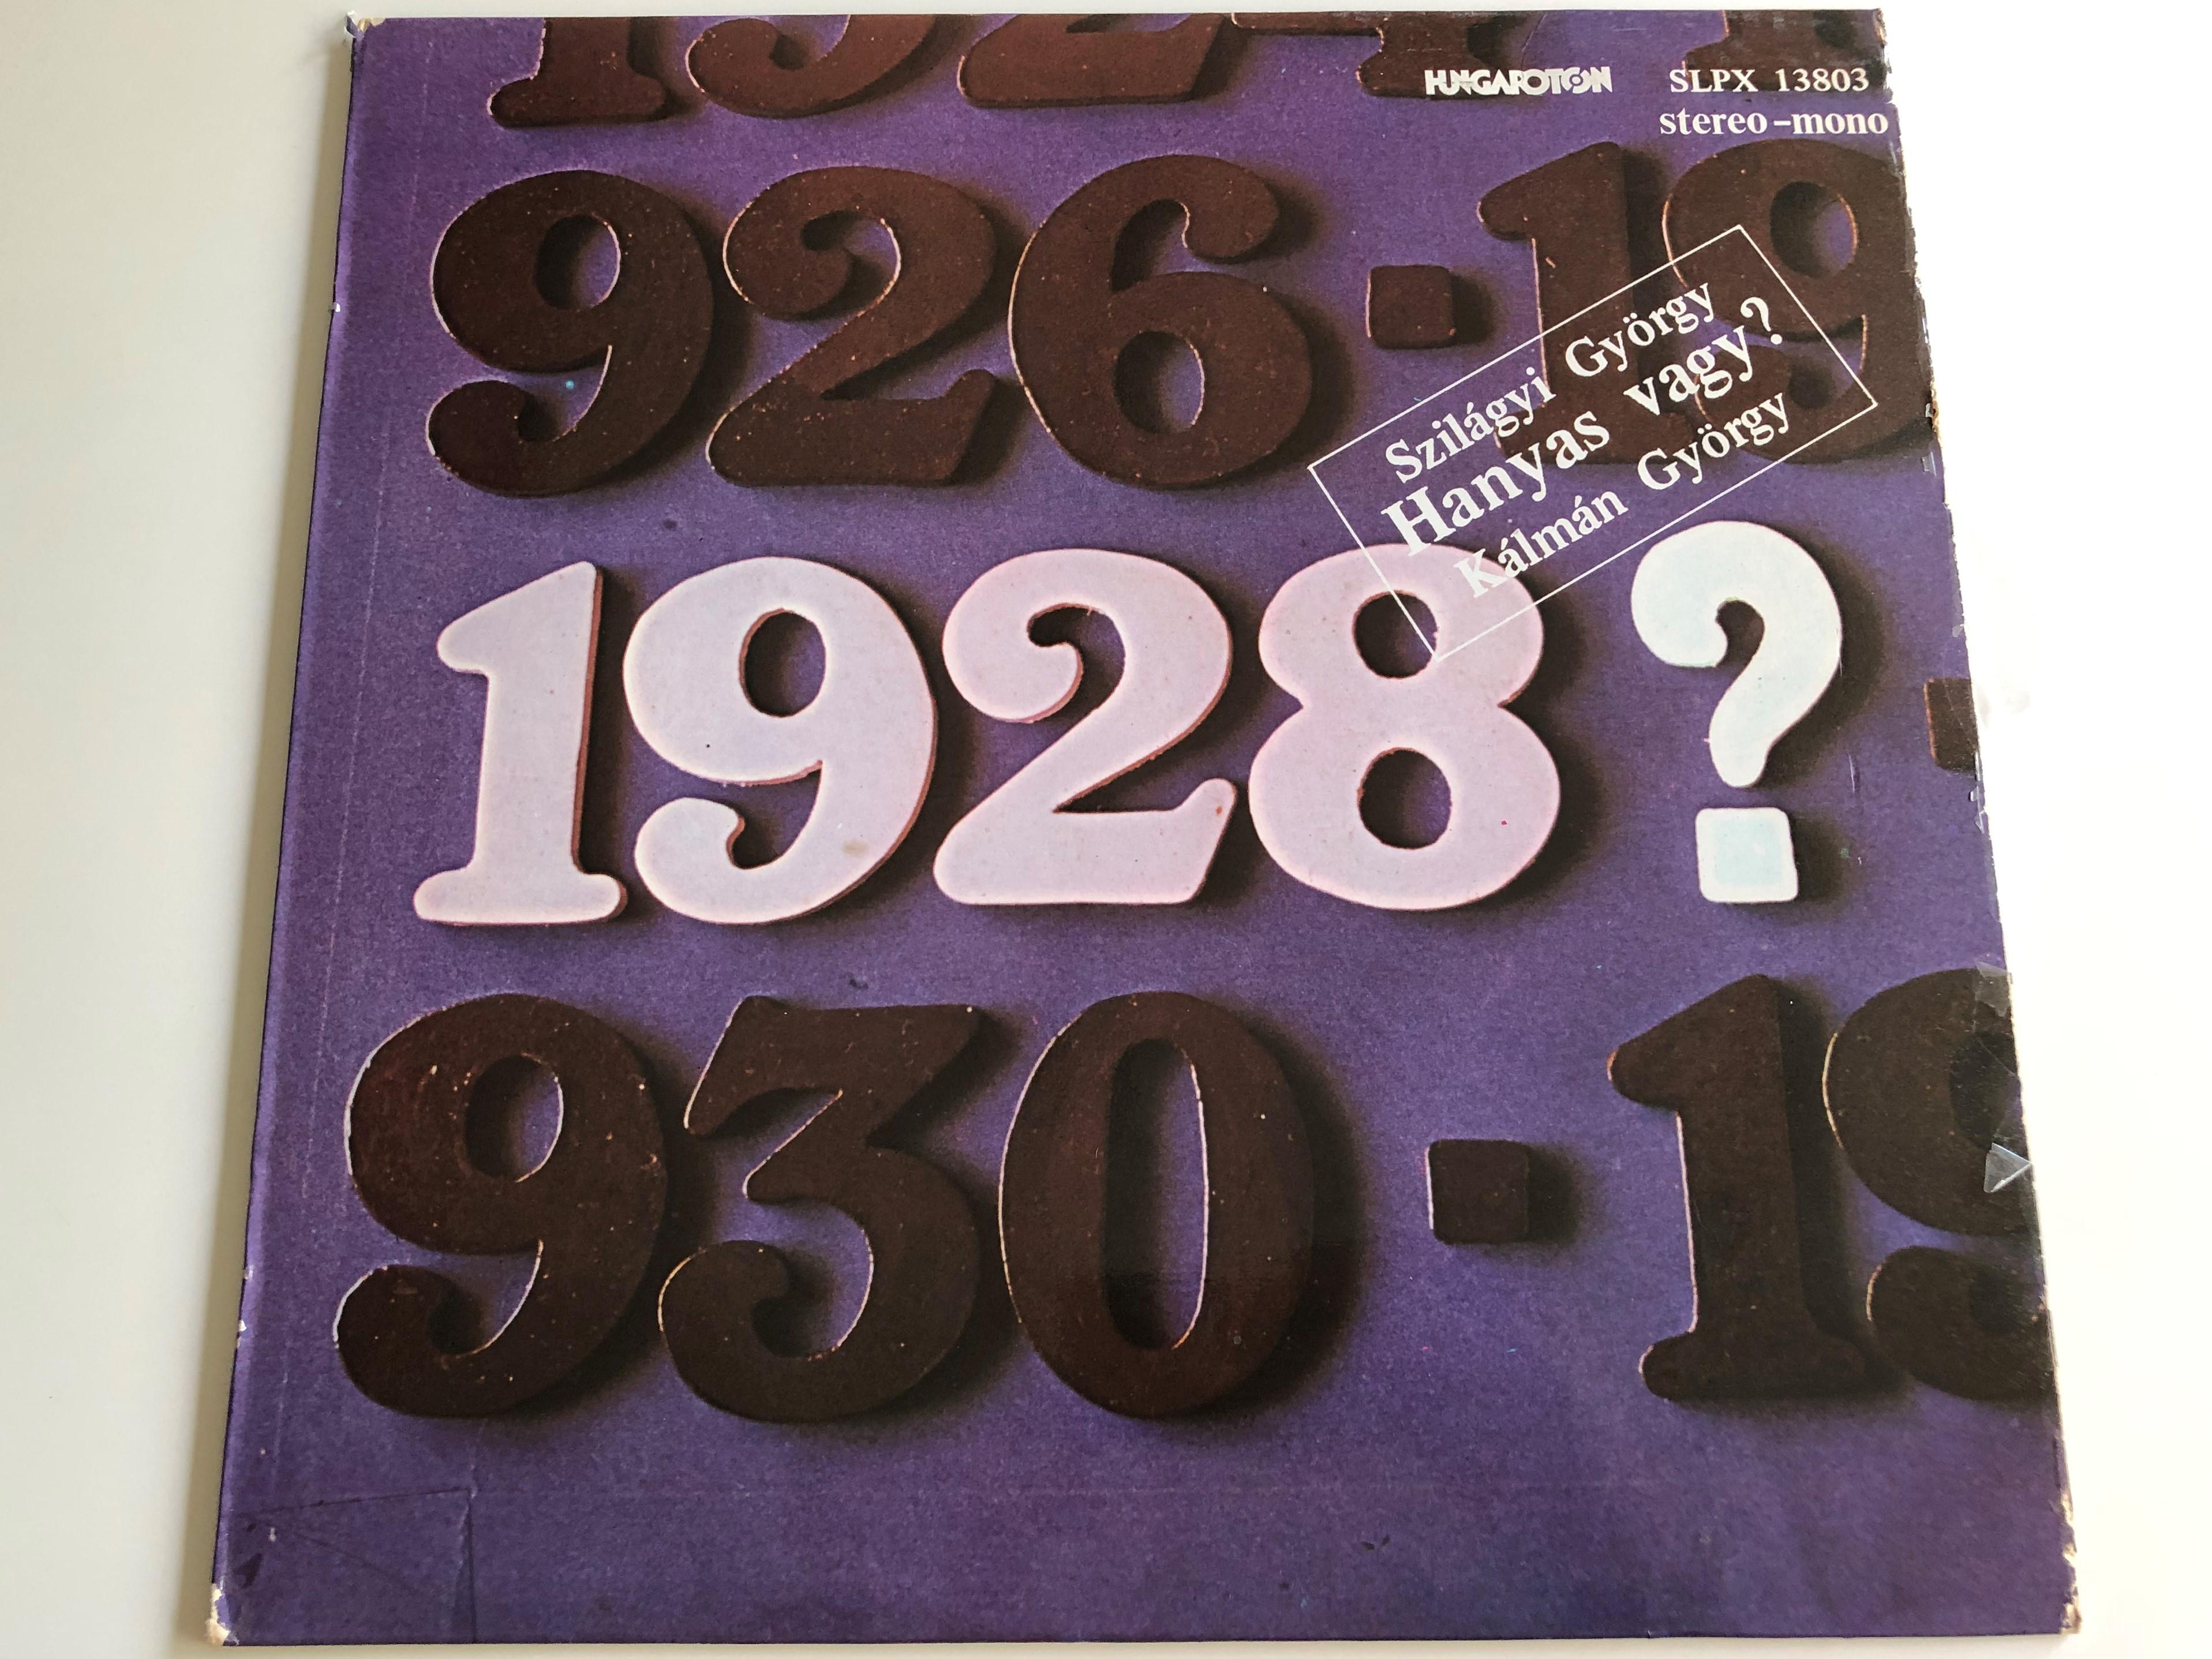 szil-gyi-gy-rgy-hanyas-vagy-1928-k-lm-n-gy-rgy-directed-by-boz-l-szl-hungarian-radio-recording-1977-slpx-13803-stereo-mono-1-.jpg